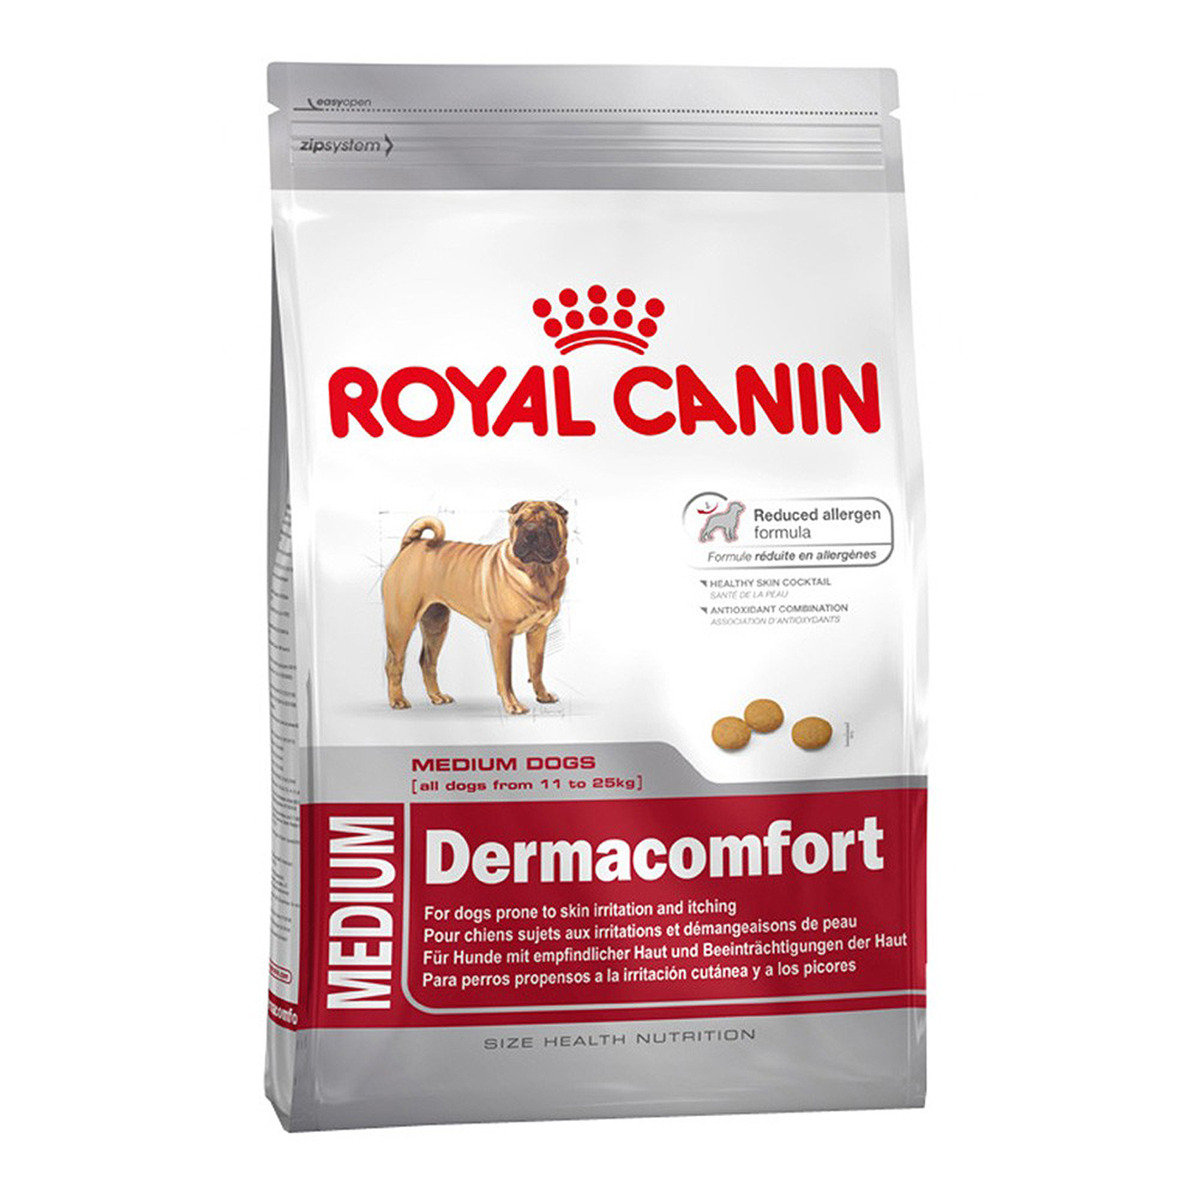 Medium Dermacomfort 24 皮膚敏感專用 (DCME)